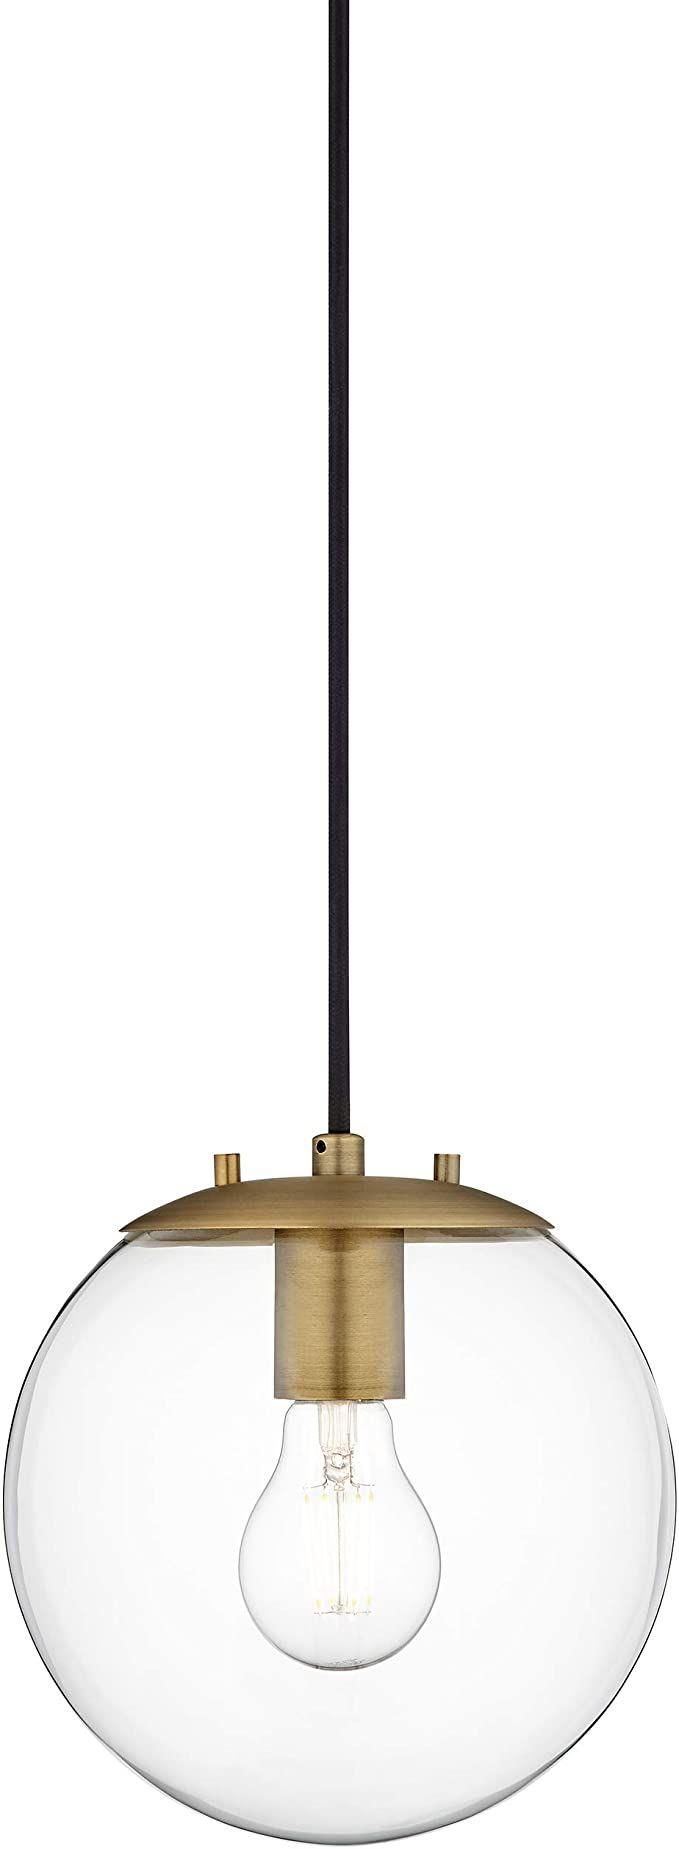 Sferra Globe Pendant Light Brass Pendant Lighting For Kitchen Island With Led Bulb Ll P201 A Globe Pendant Light Fixture Pendant Light Pendant Light Fixtures